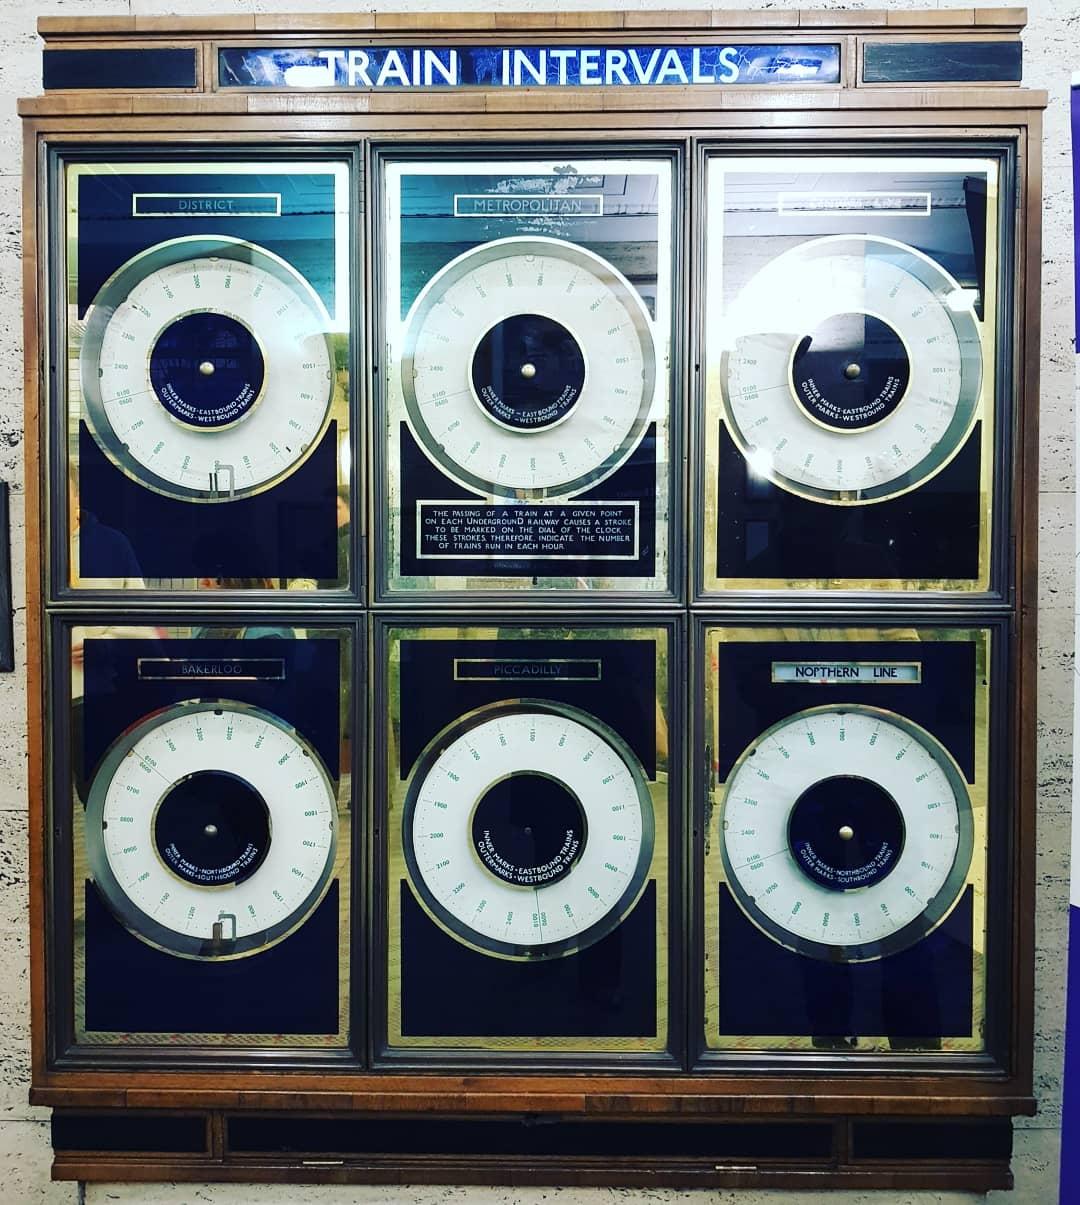 55 clocks